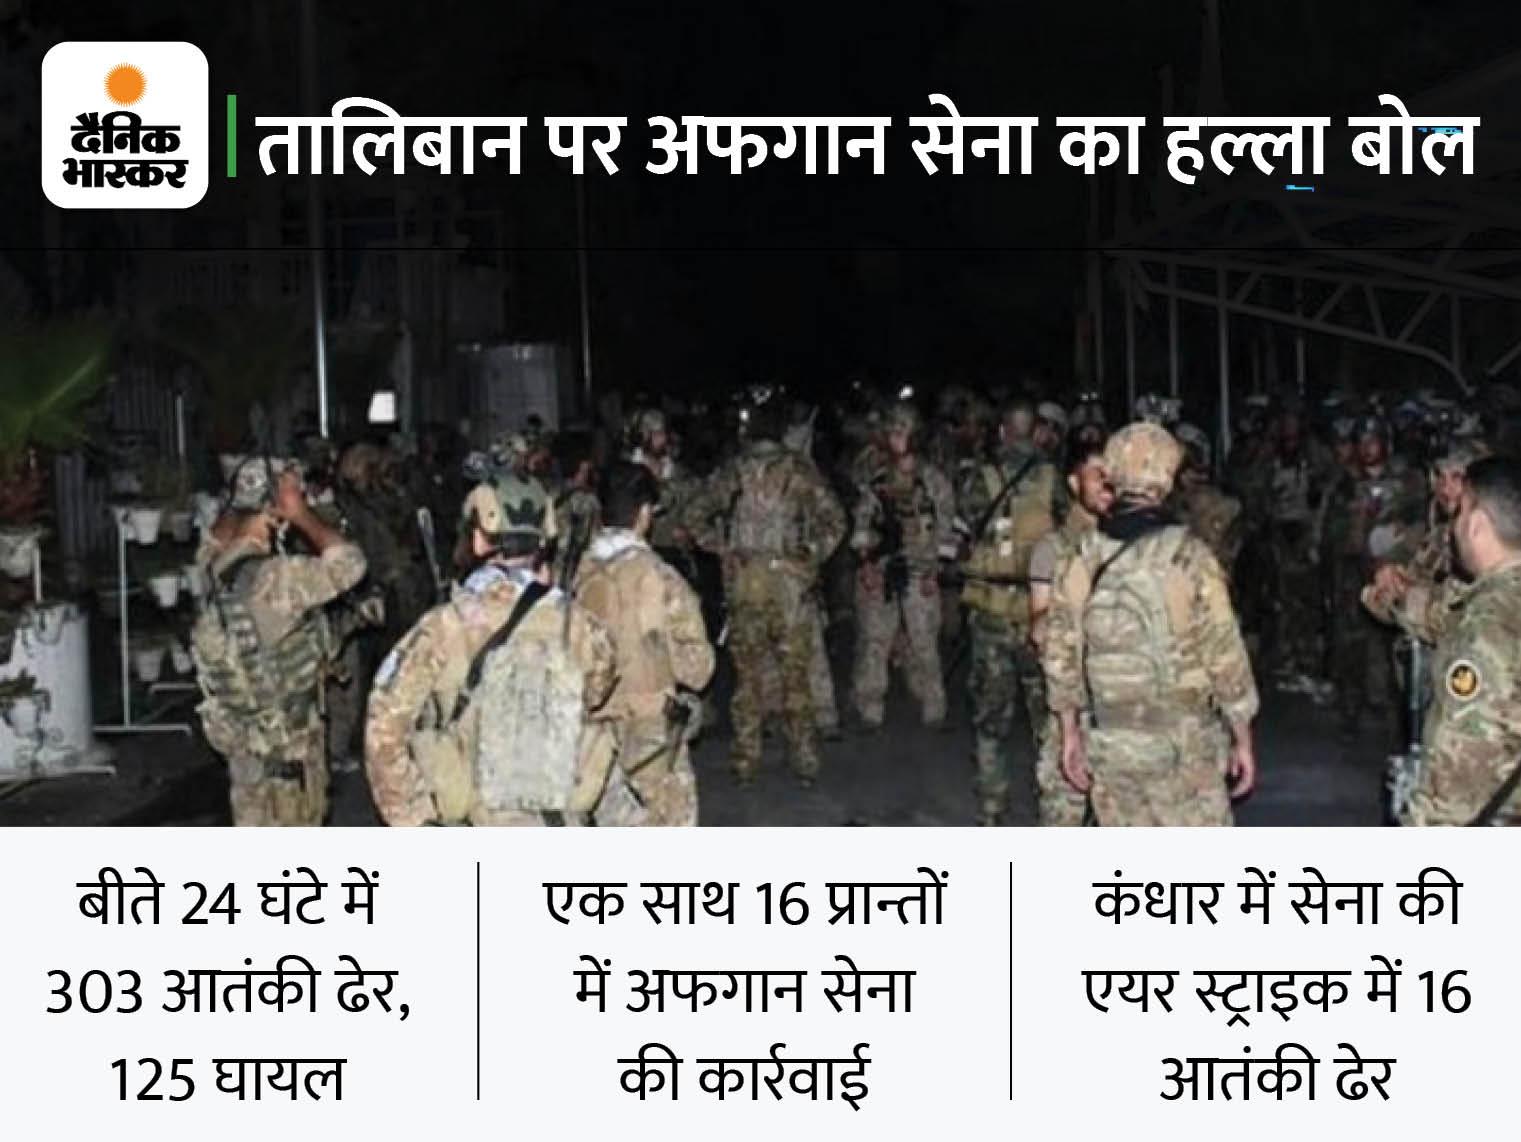 बीते 24 घंटे में 300 से ज्यादा तालिबानी आतंकी मार गिराए, 125 घायल; दहशतगर्दी के ठिकाने ध्वस्त विदेश,International - Dainik Bhaskar